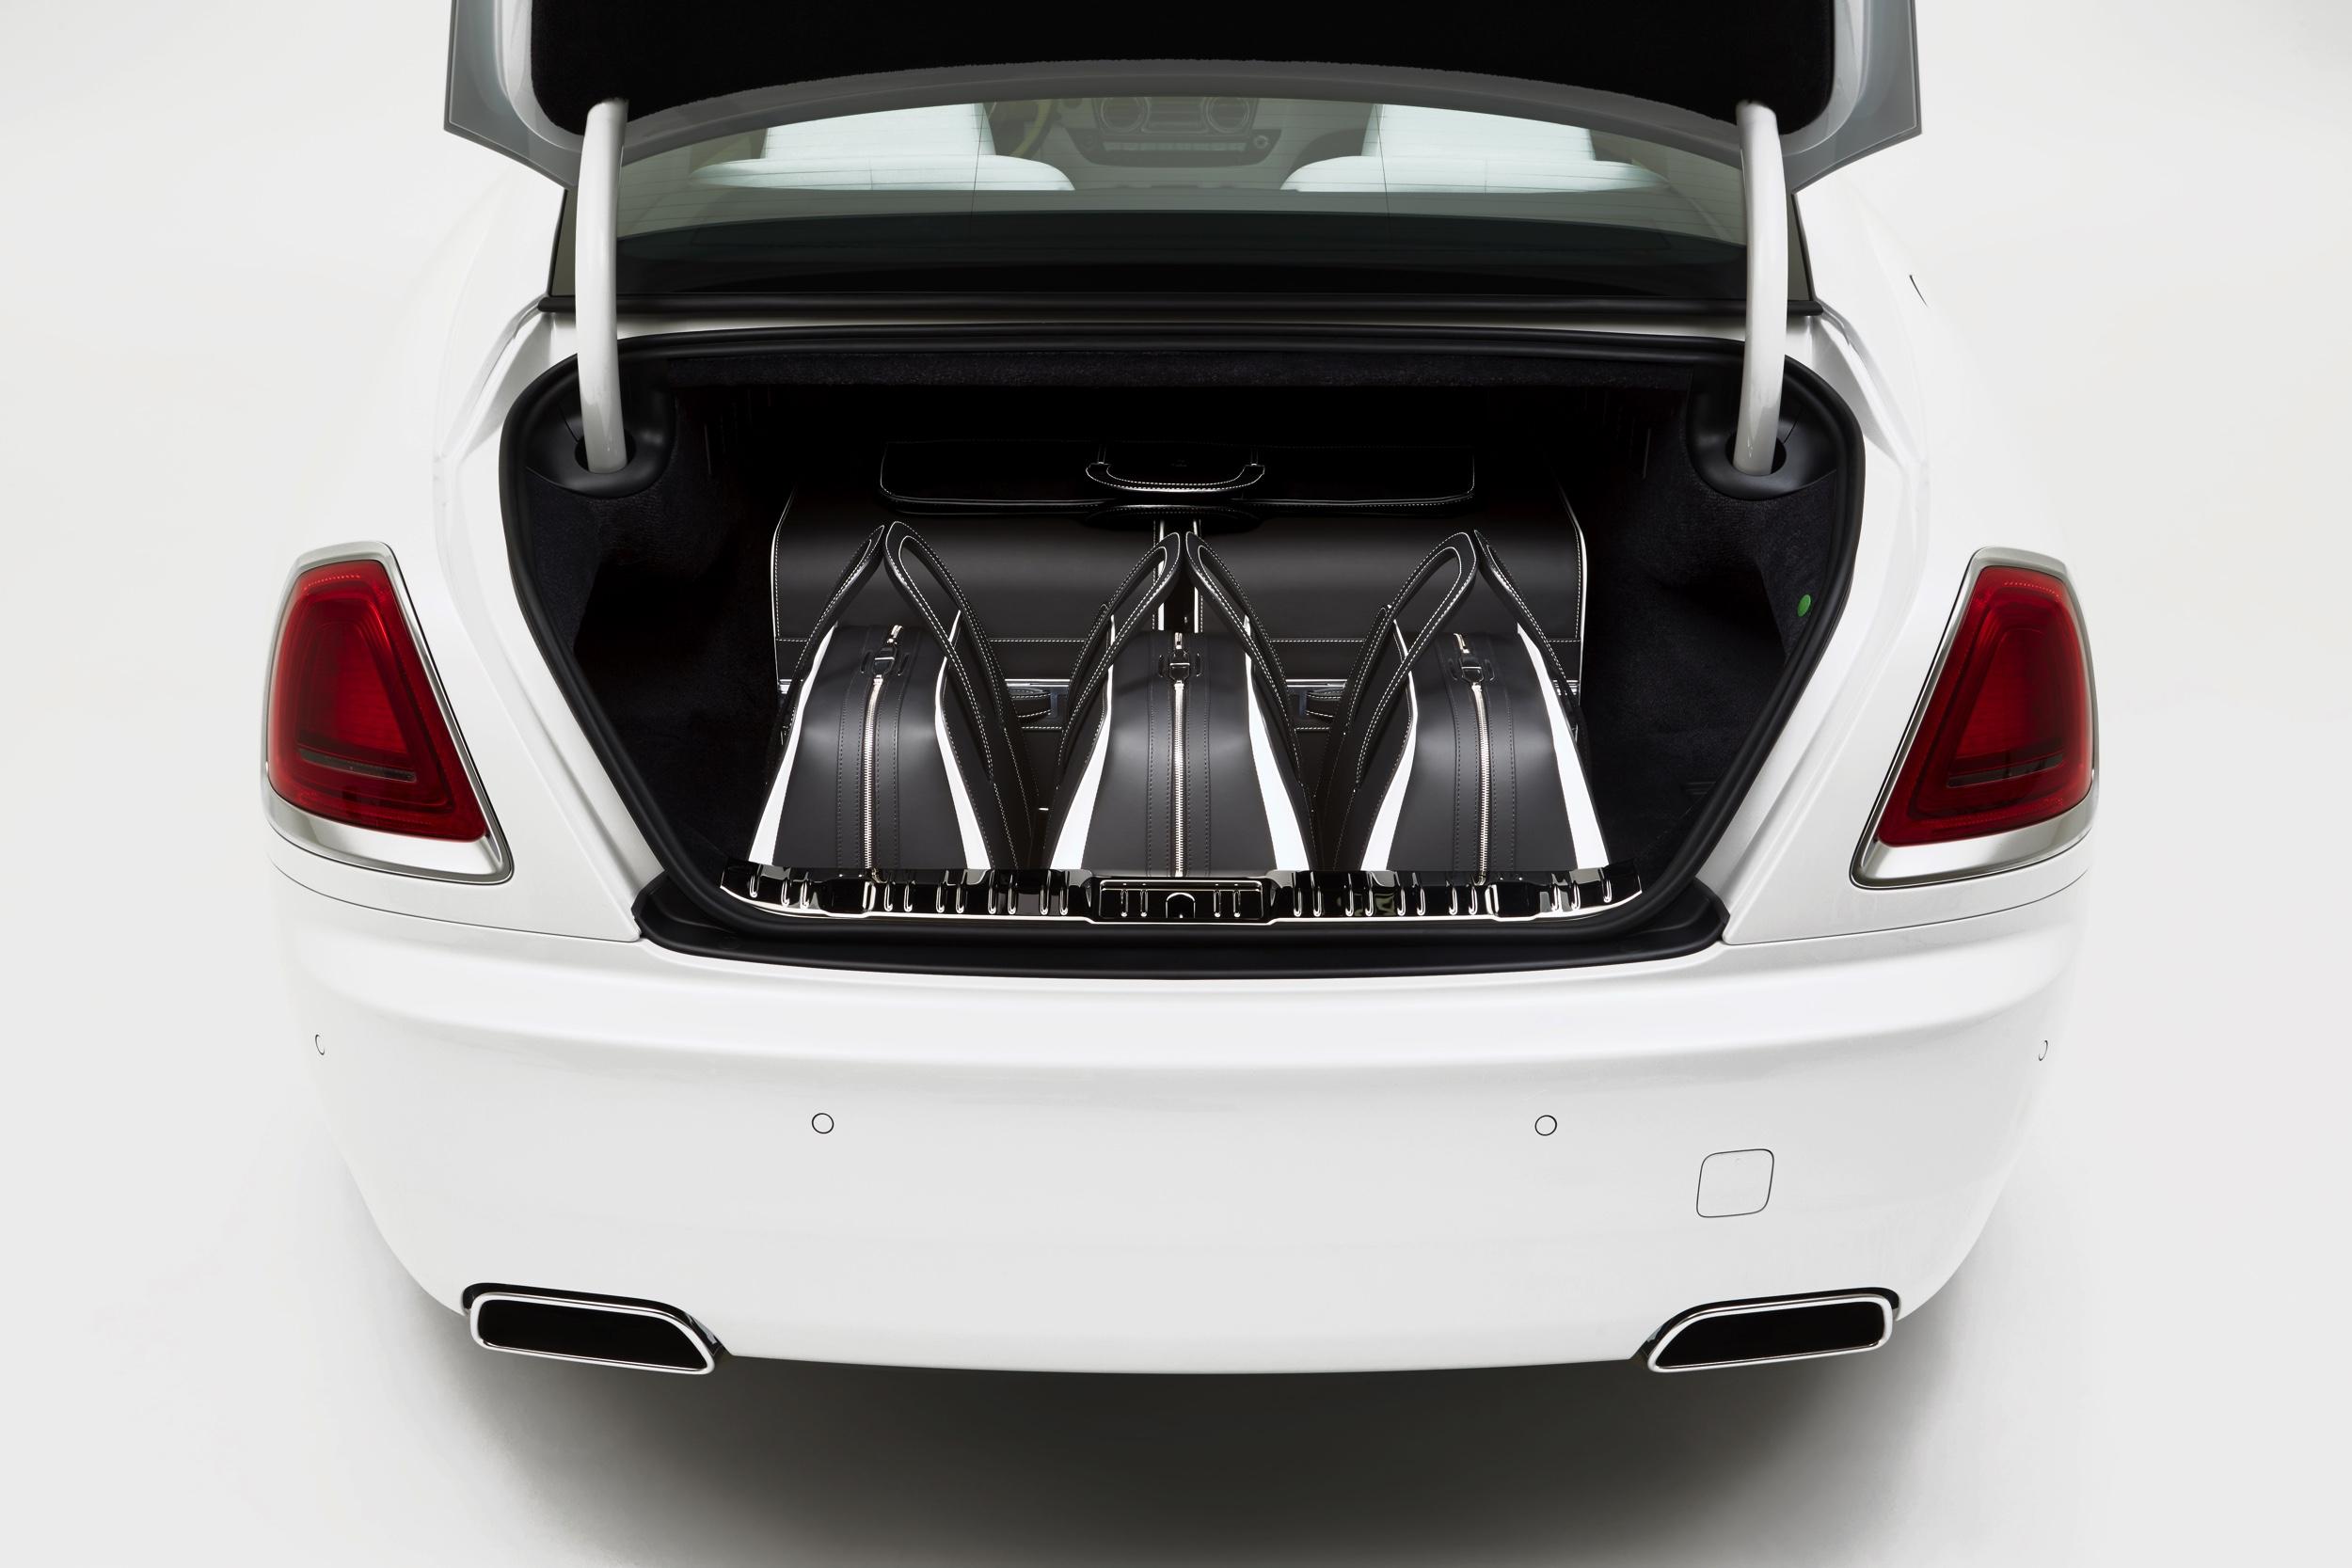 Kofferset Rolls-Royce Wraith -7- Autovisie.nl